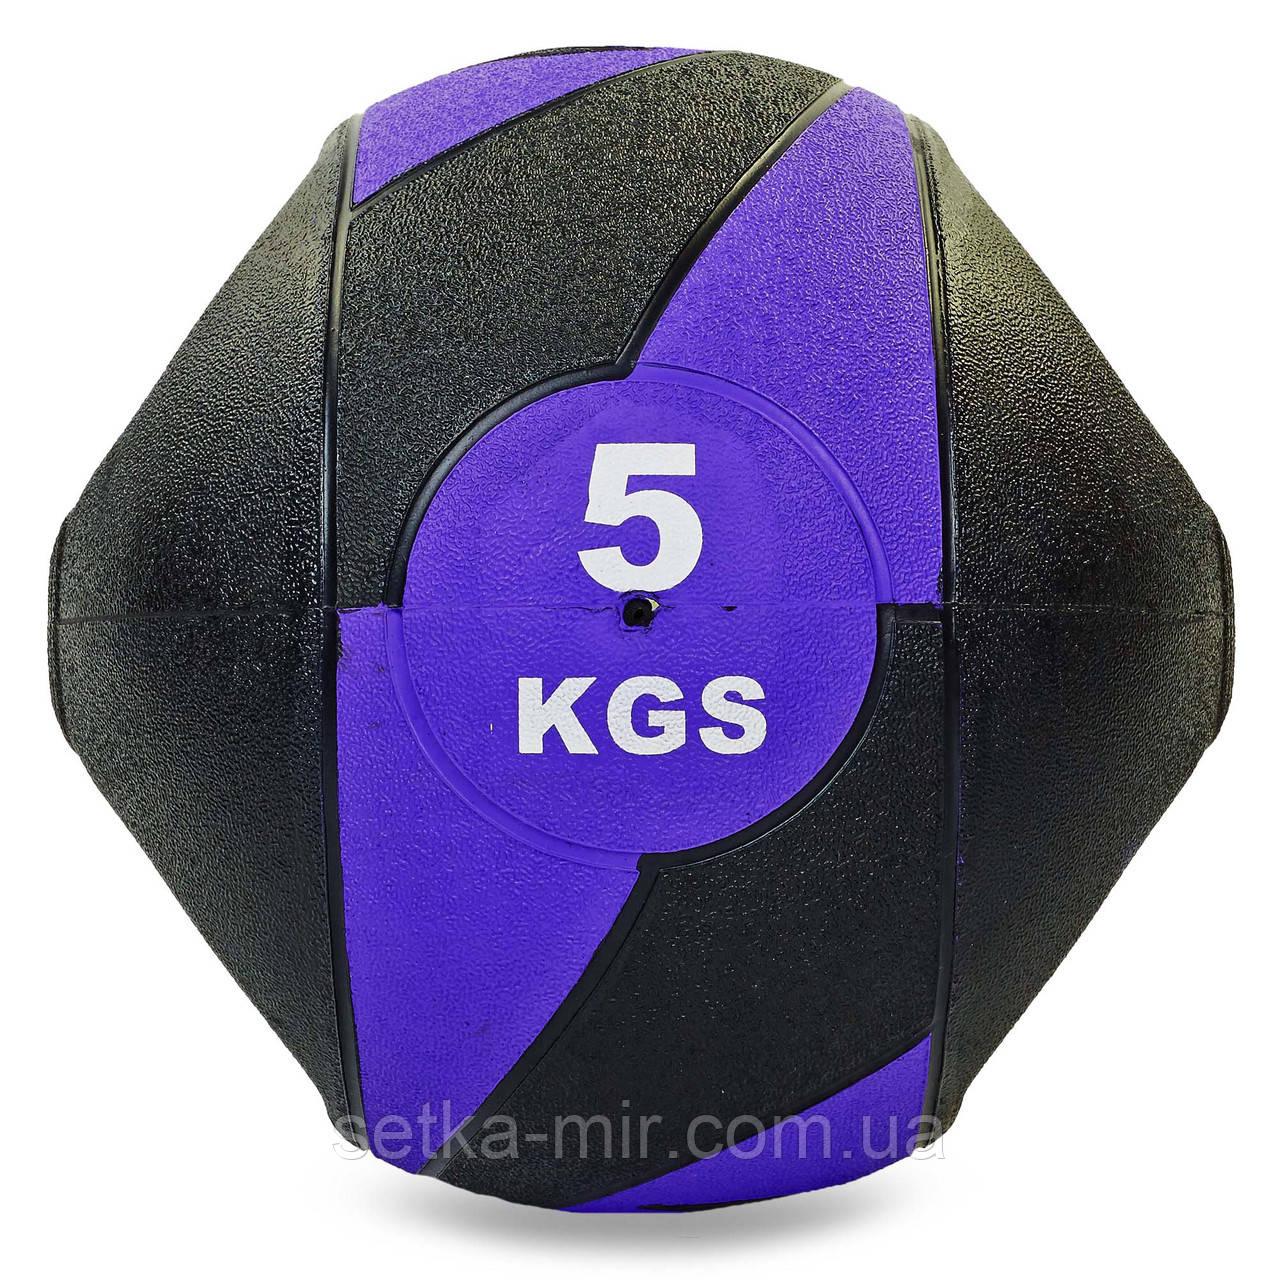 Мяч медицинский медбол с двумя рукоятками Record Medicine Ball FI-5111-5 5кг